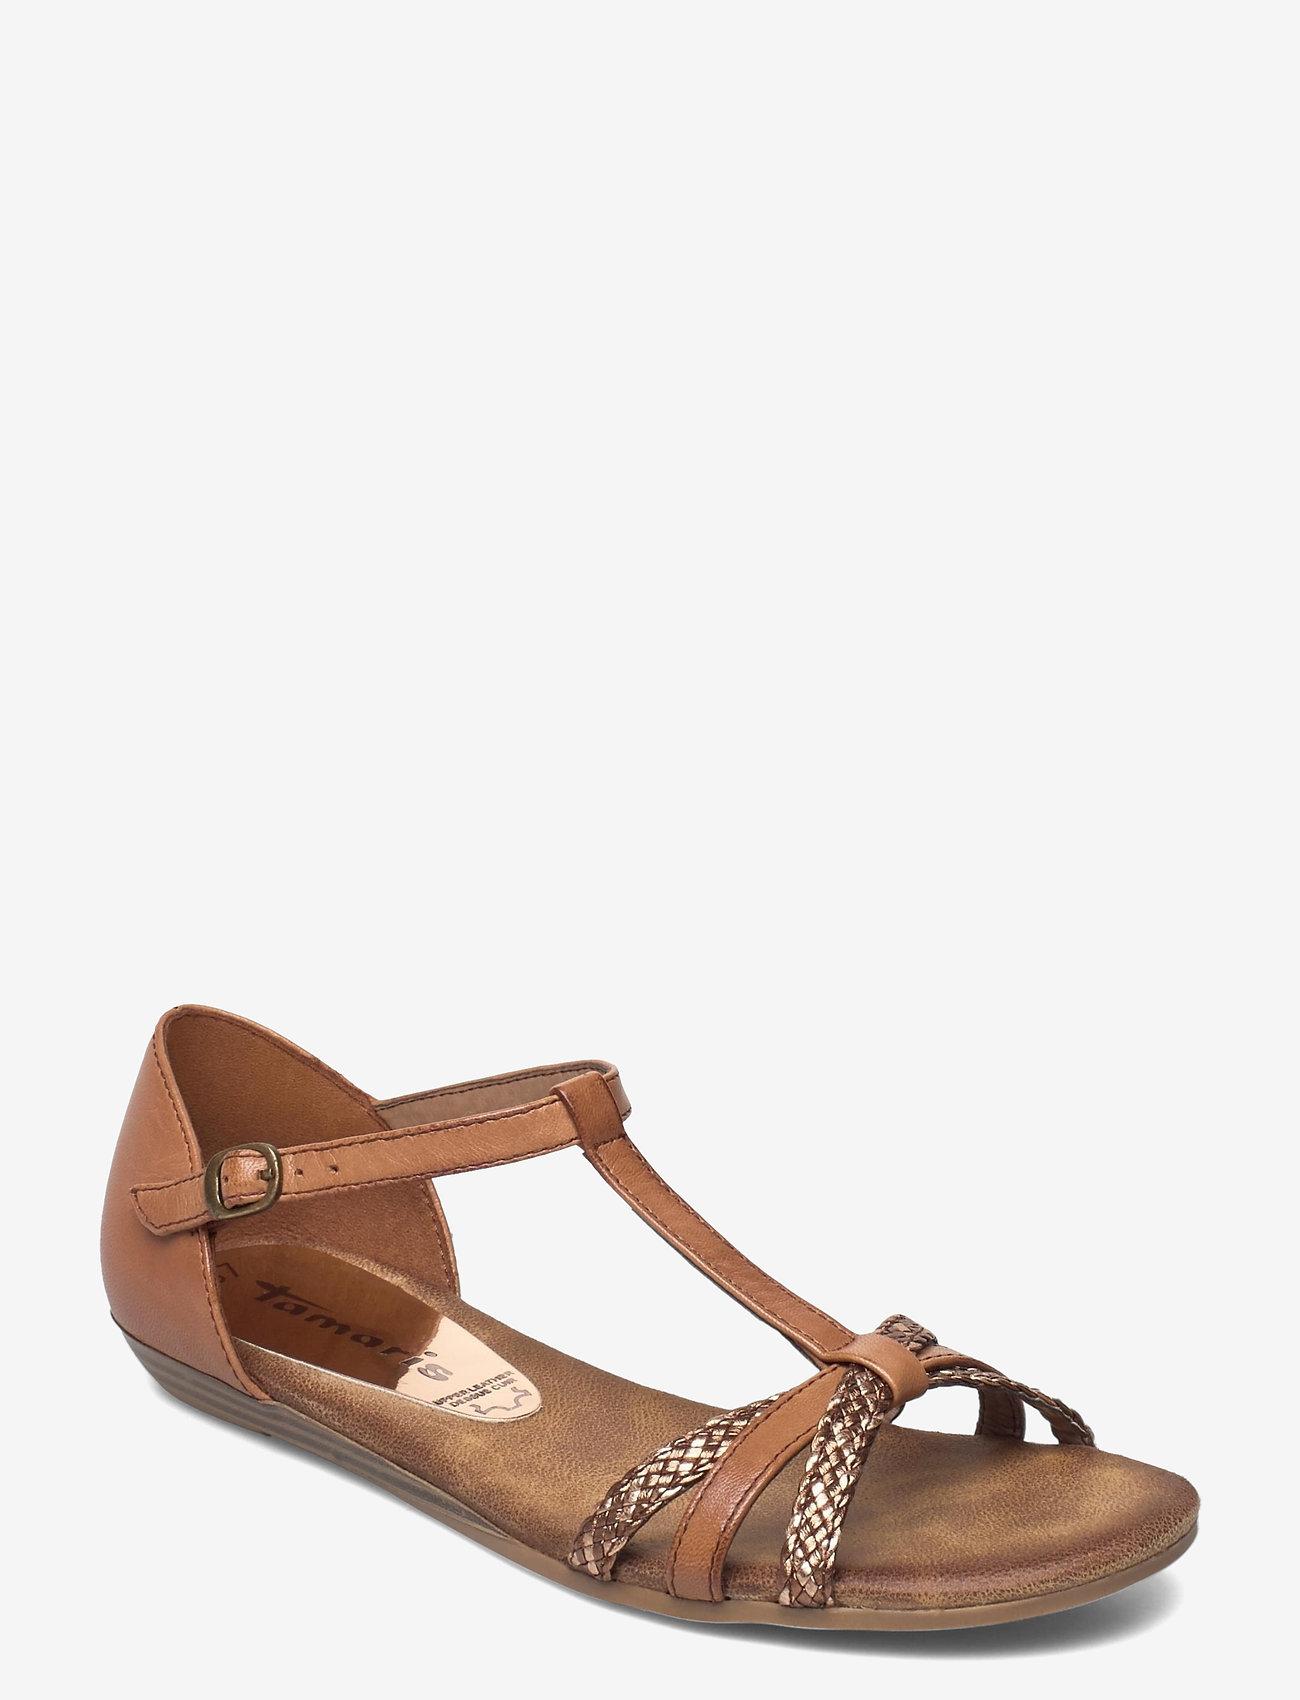 Tamaris - Woms Sandals - zempapēžu sandales - nut comb - 0